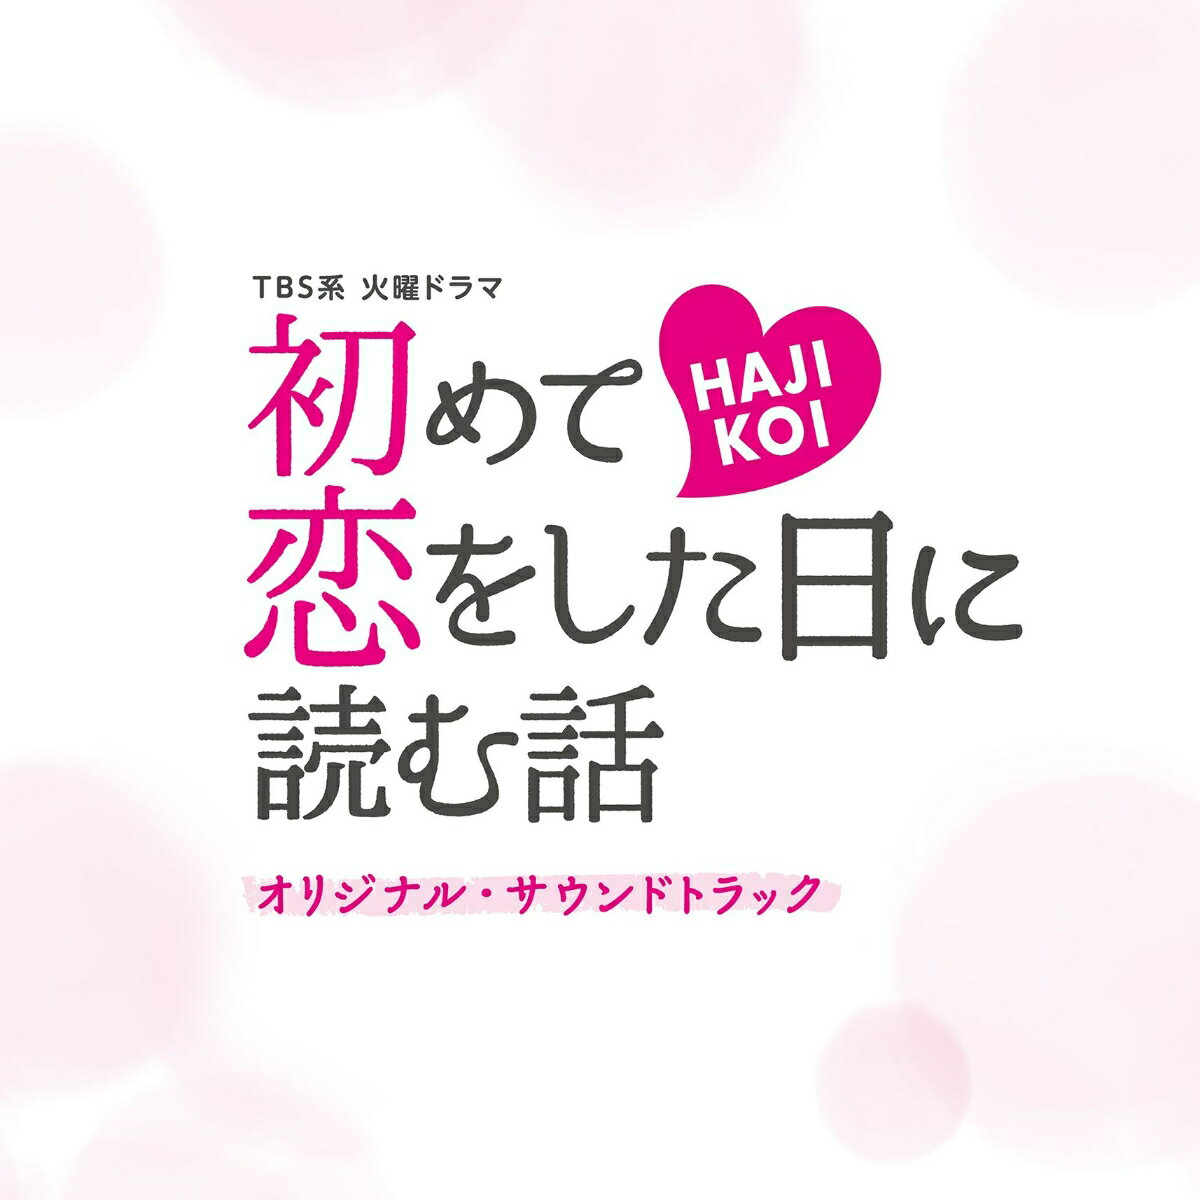 TBS系 火曜ドラマ 初めて恋をした日に読む話 オリジナル・サウンドトラック [ (オリジナル・サウンドトラック) ]